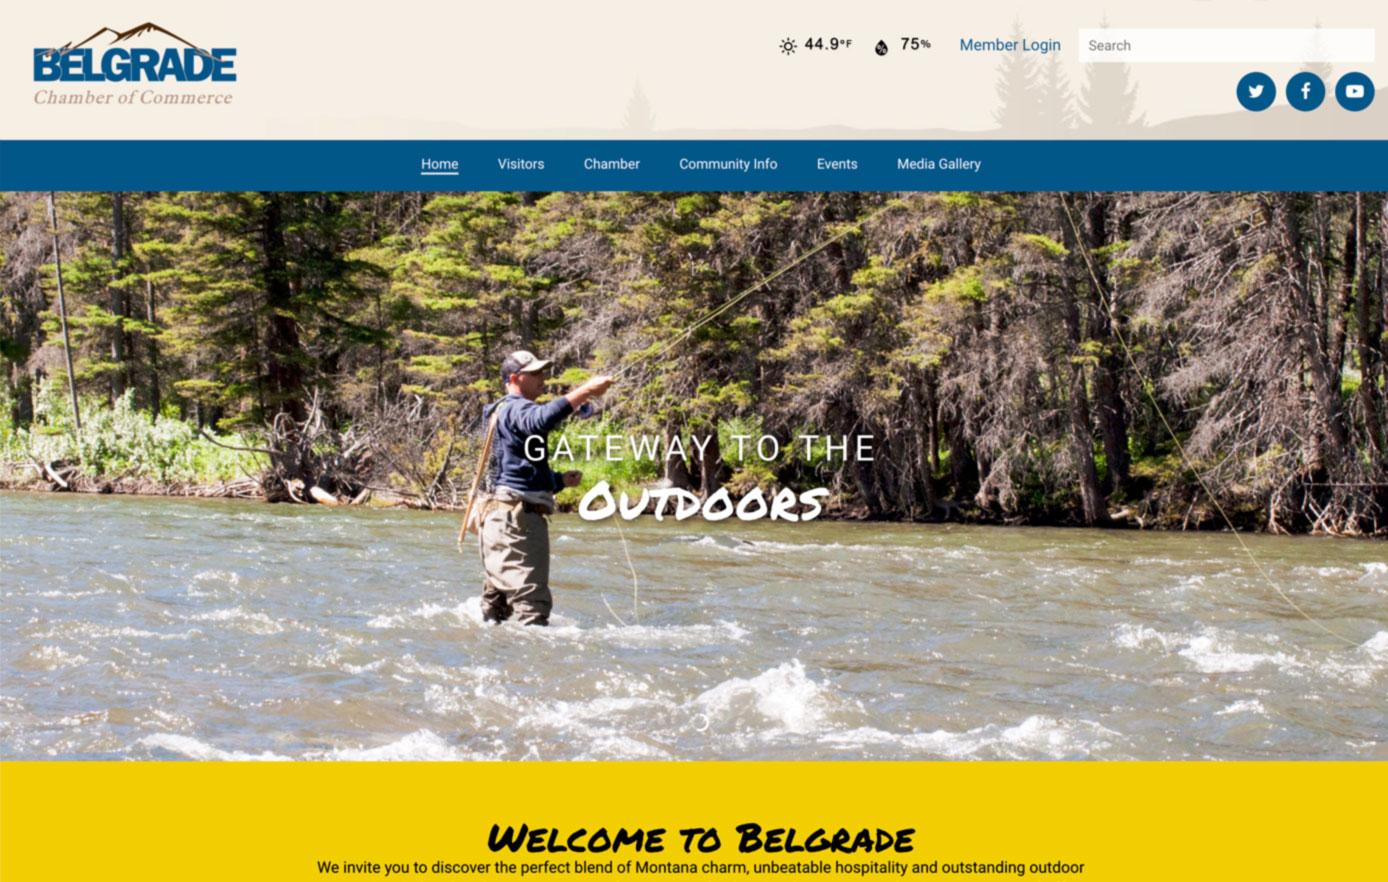 visit belgrade, website design, chamber of commerce website design